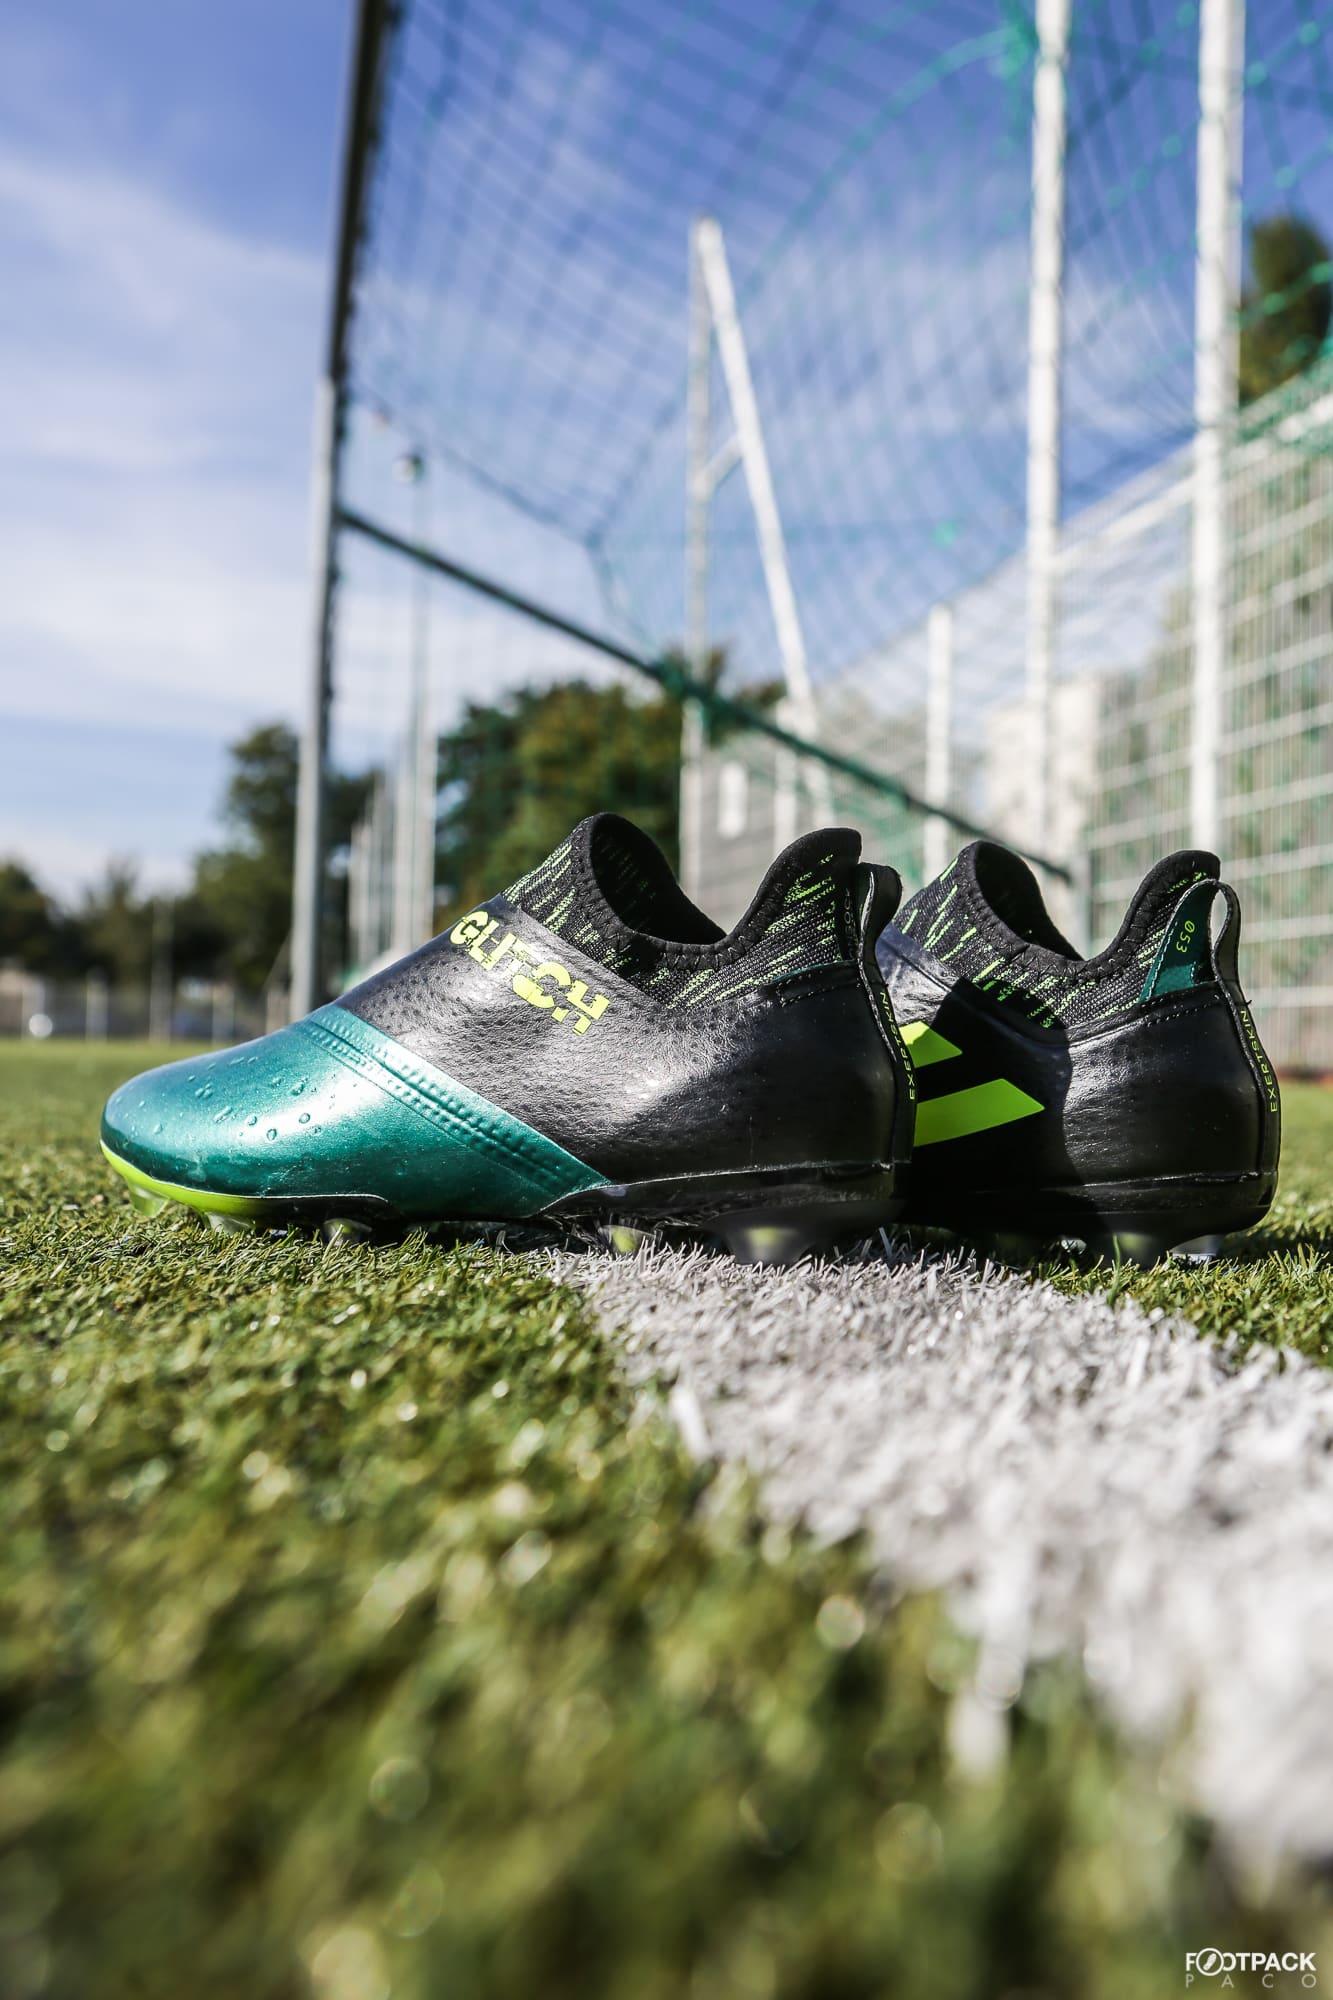 adidas-glitch-skin-exert-6